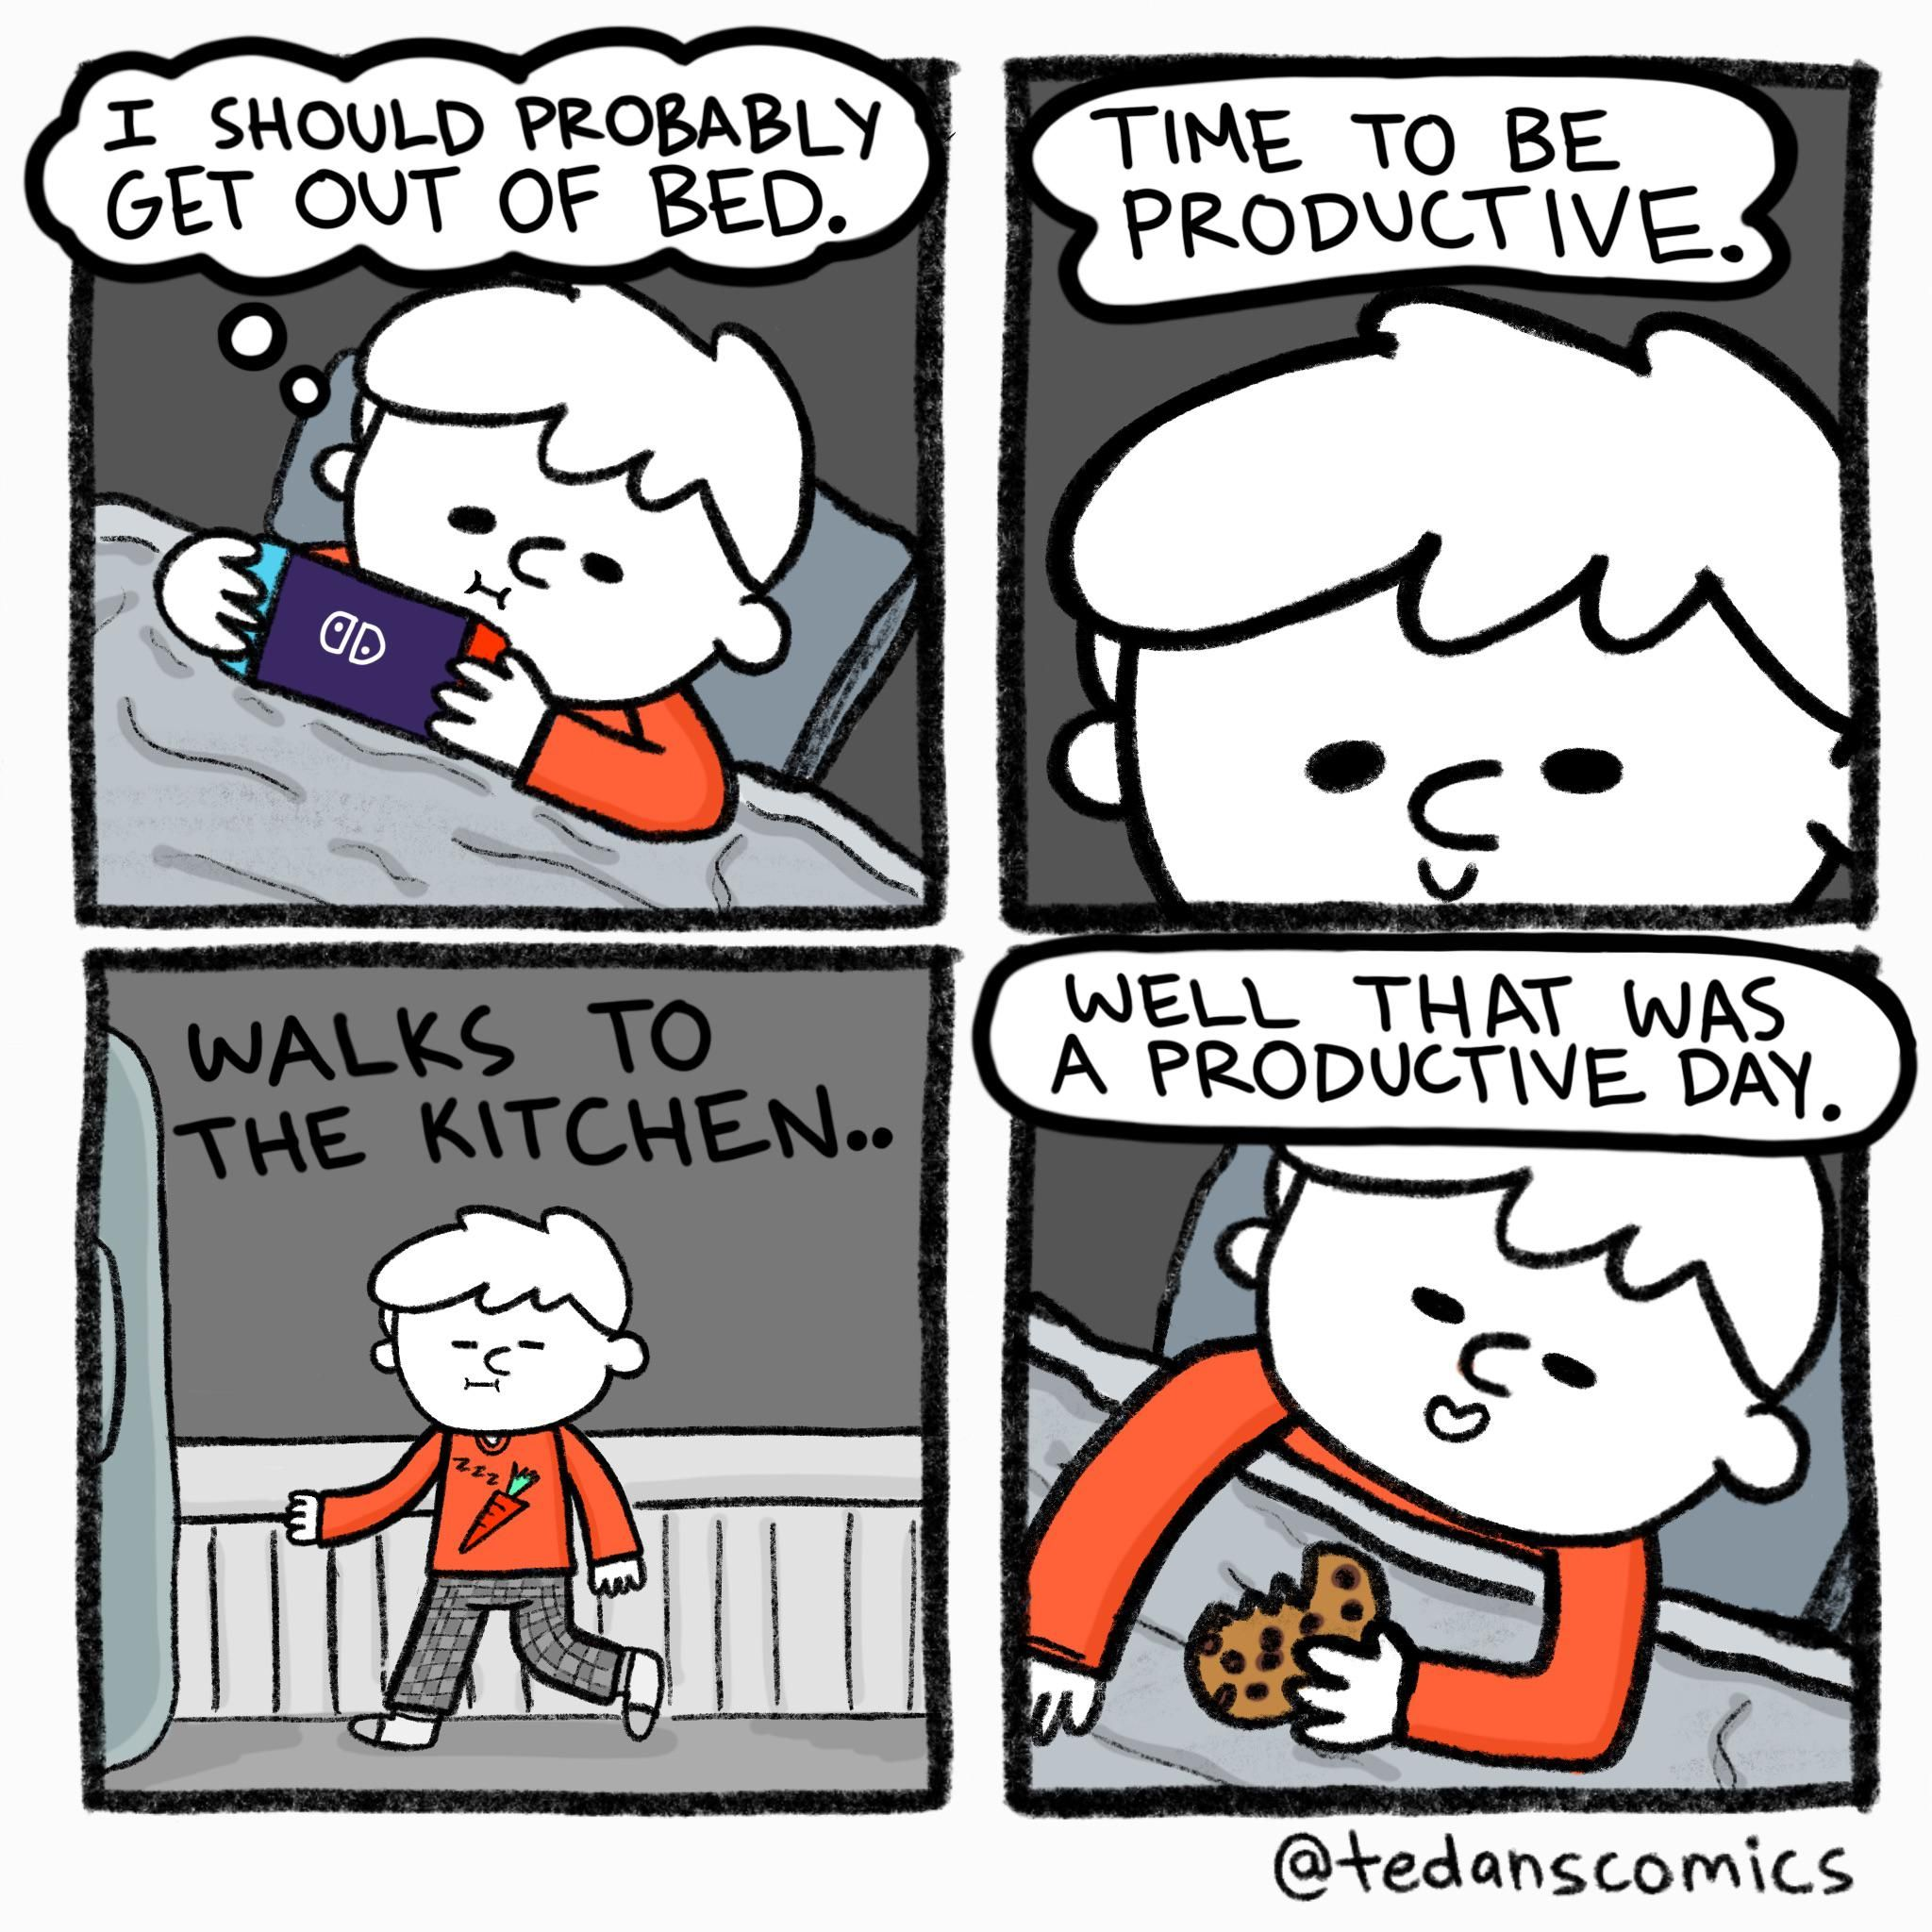 A comic about productivity